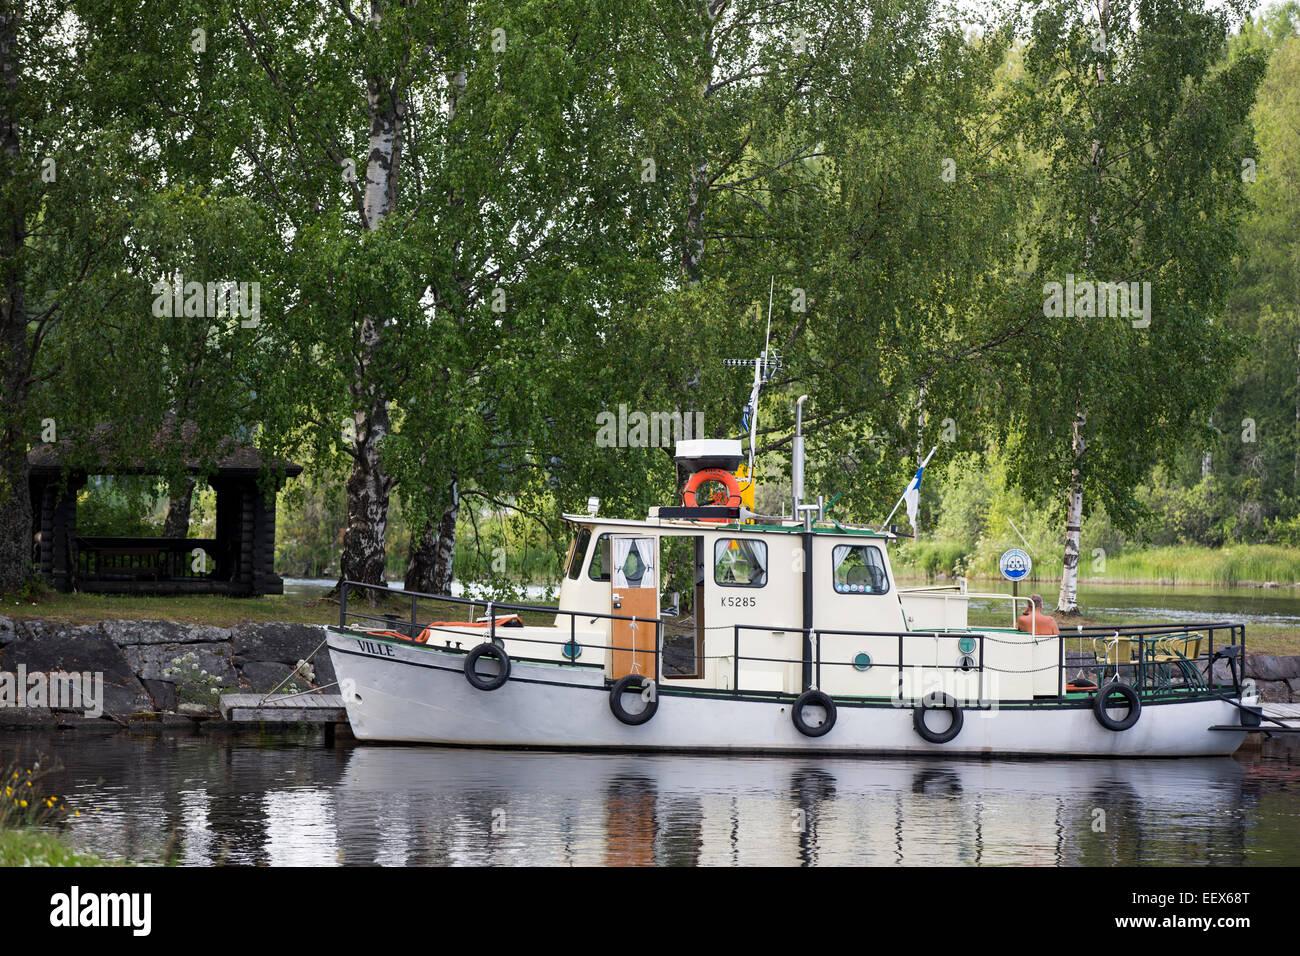 Pequeños e interiores antiguos tuck embarcación utilizada como barco turístico Konnuskosken kanava en Finlandia Foto de stock